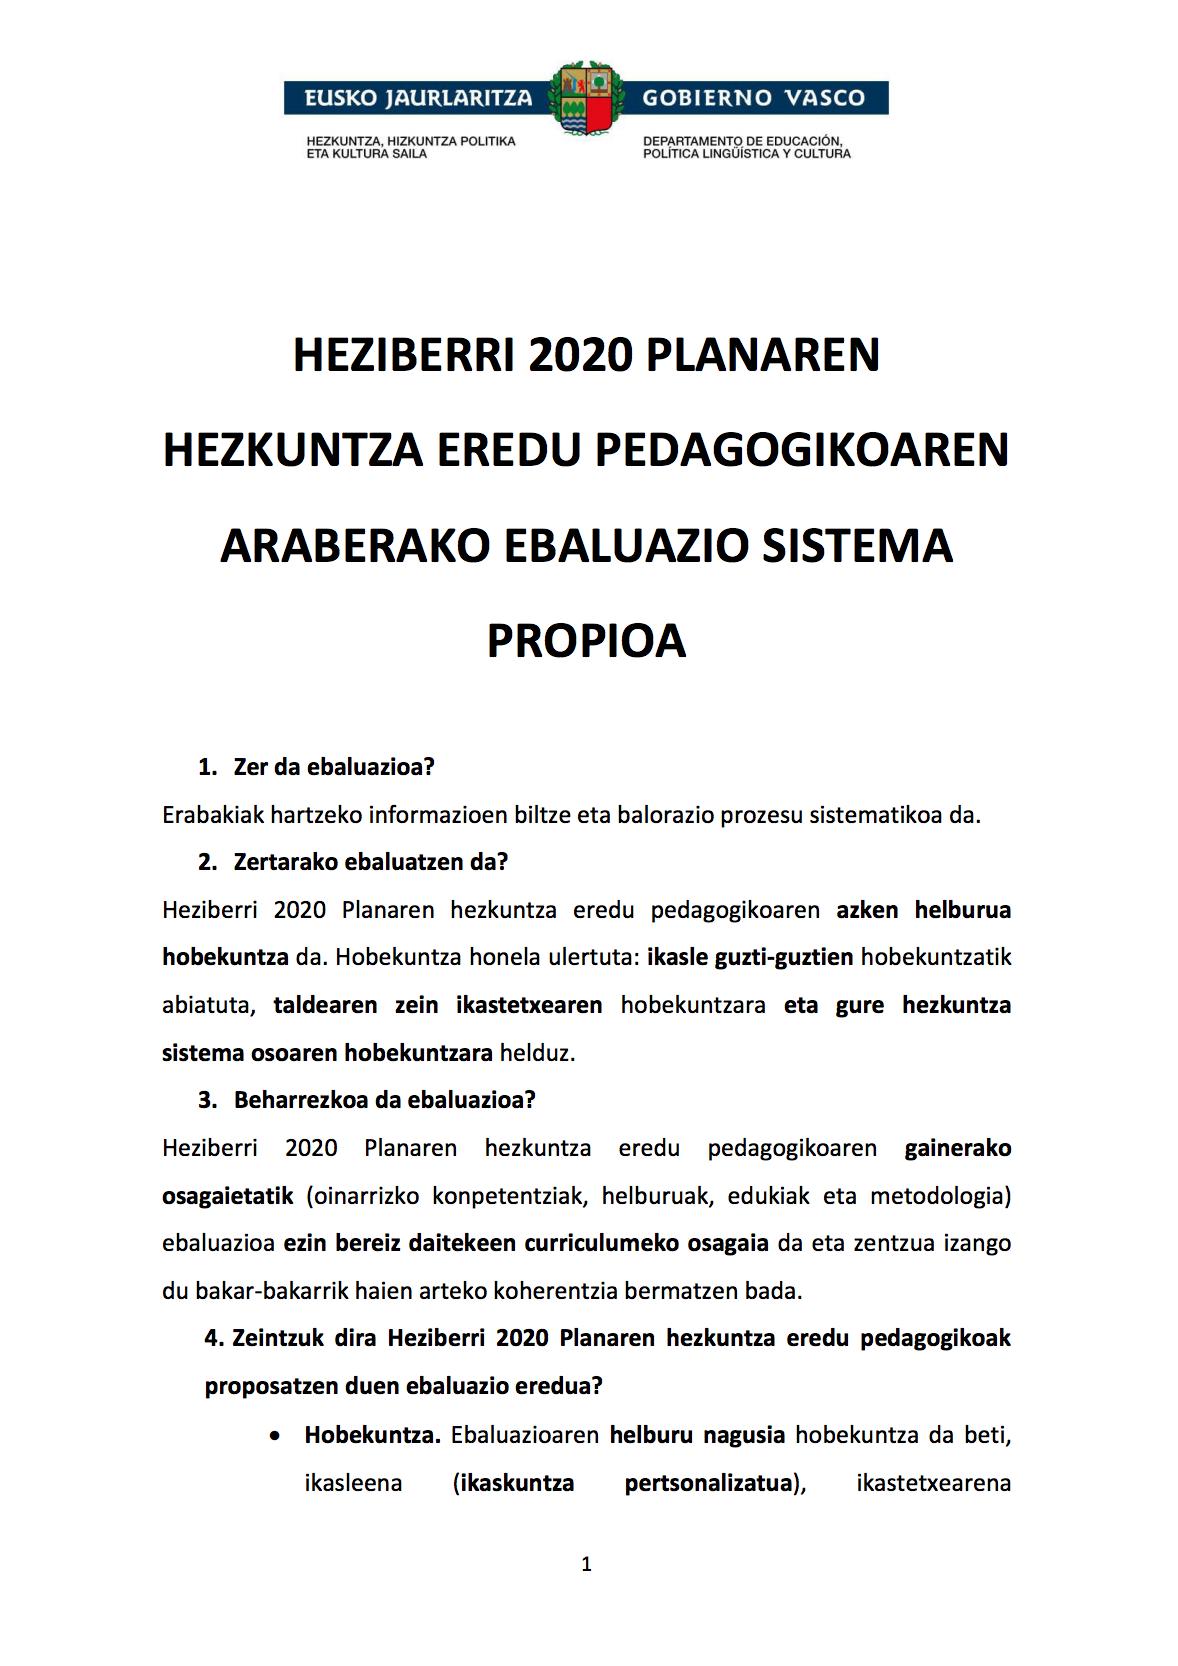 HEZIBERRI 2020 PLANA